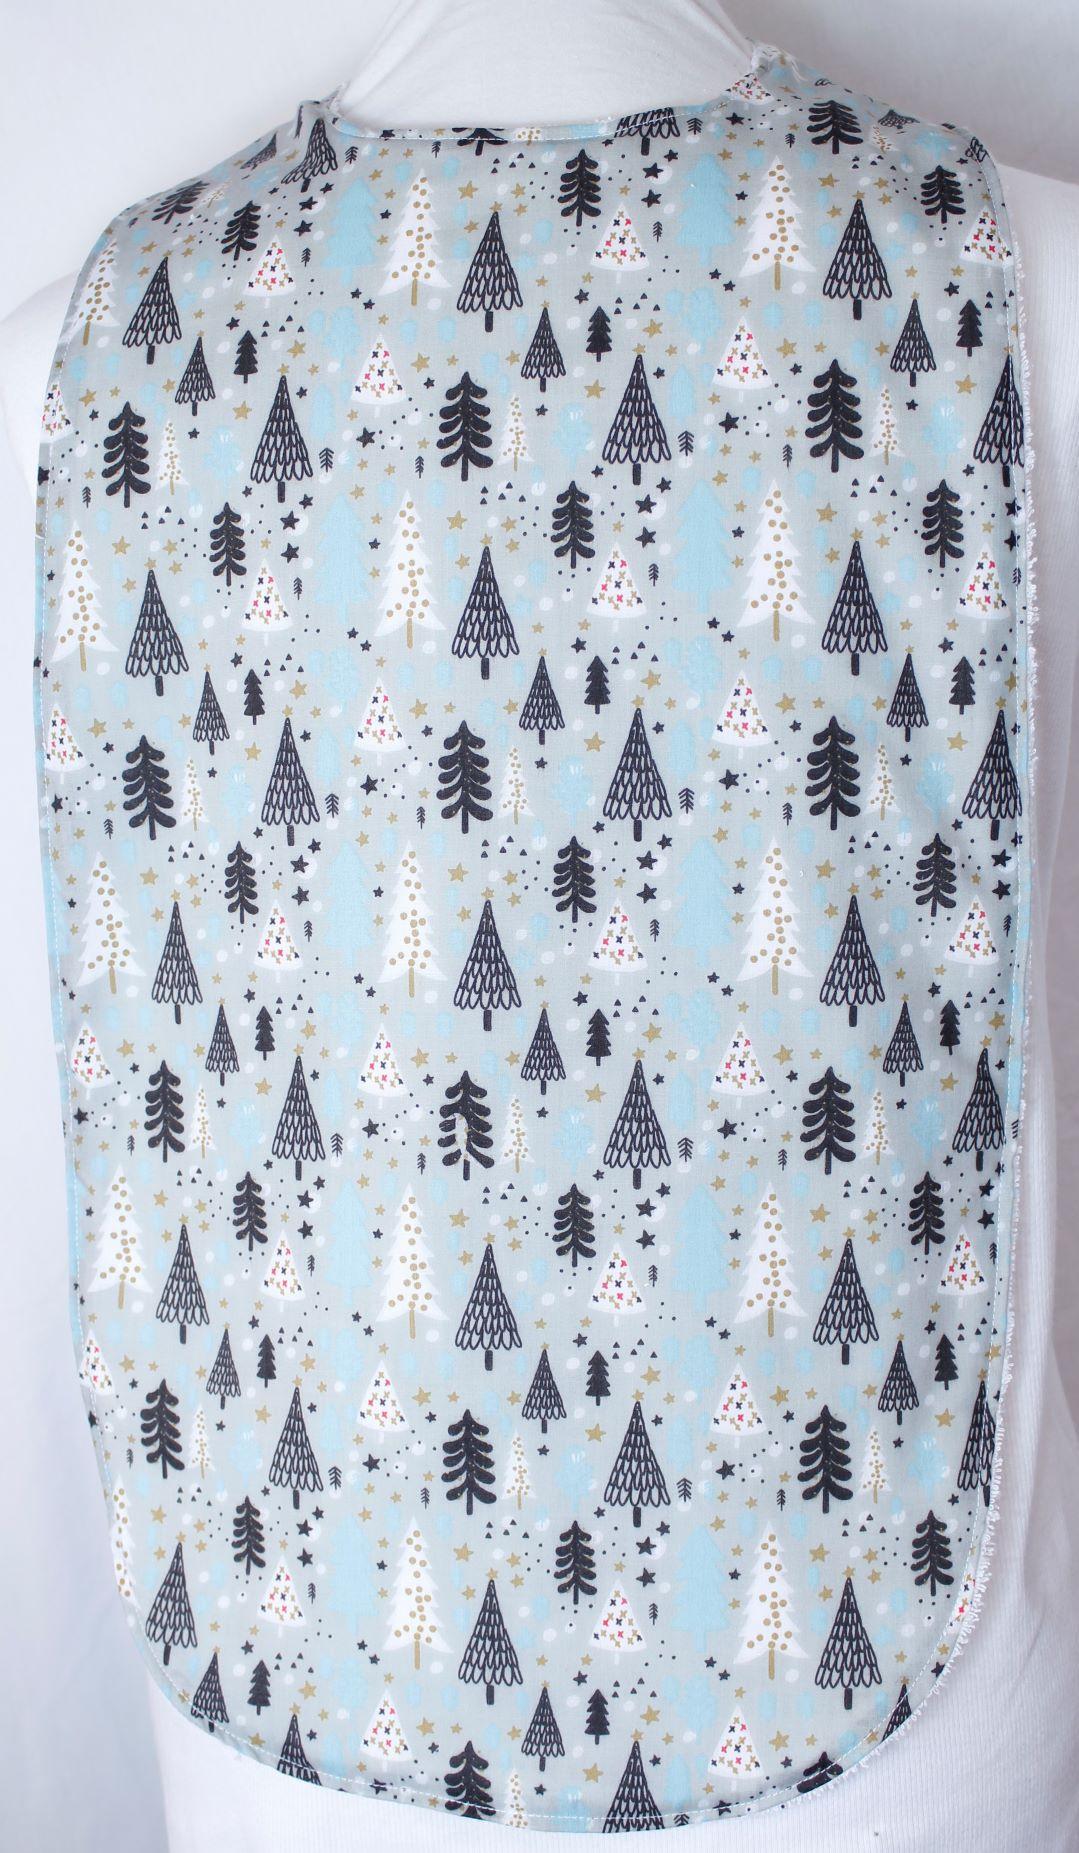 Winter Wonderland Long Length Clothing Protector